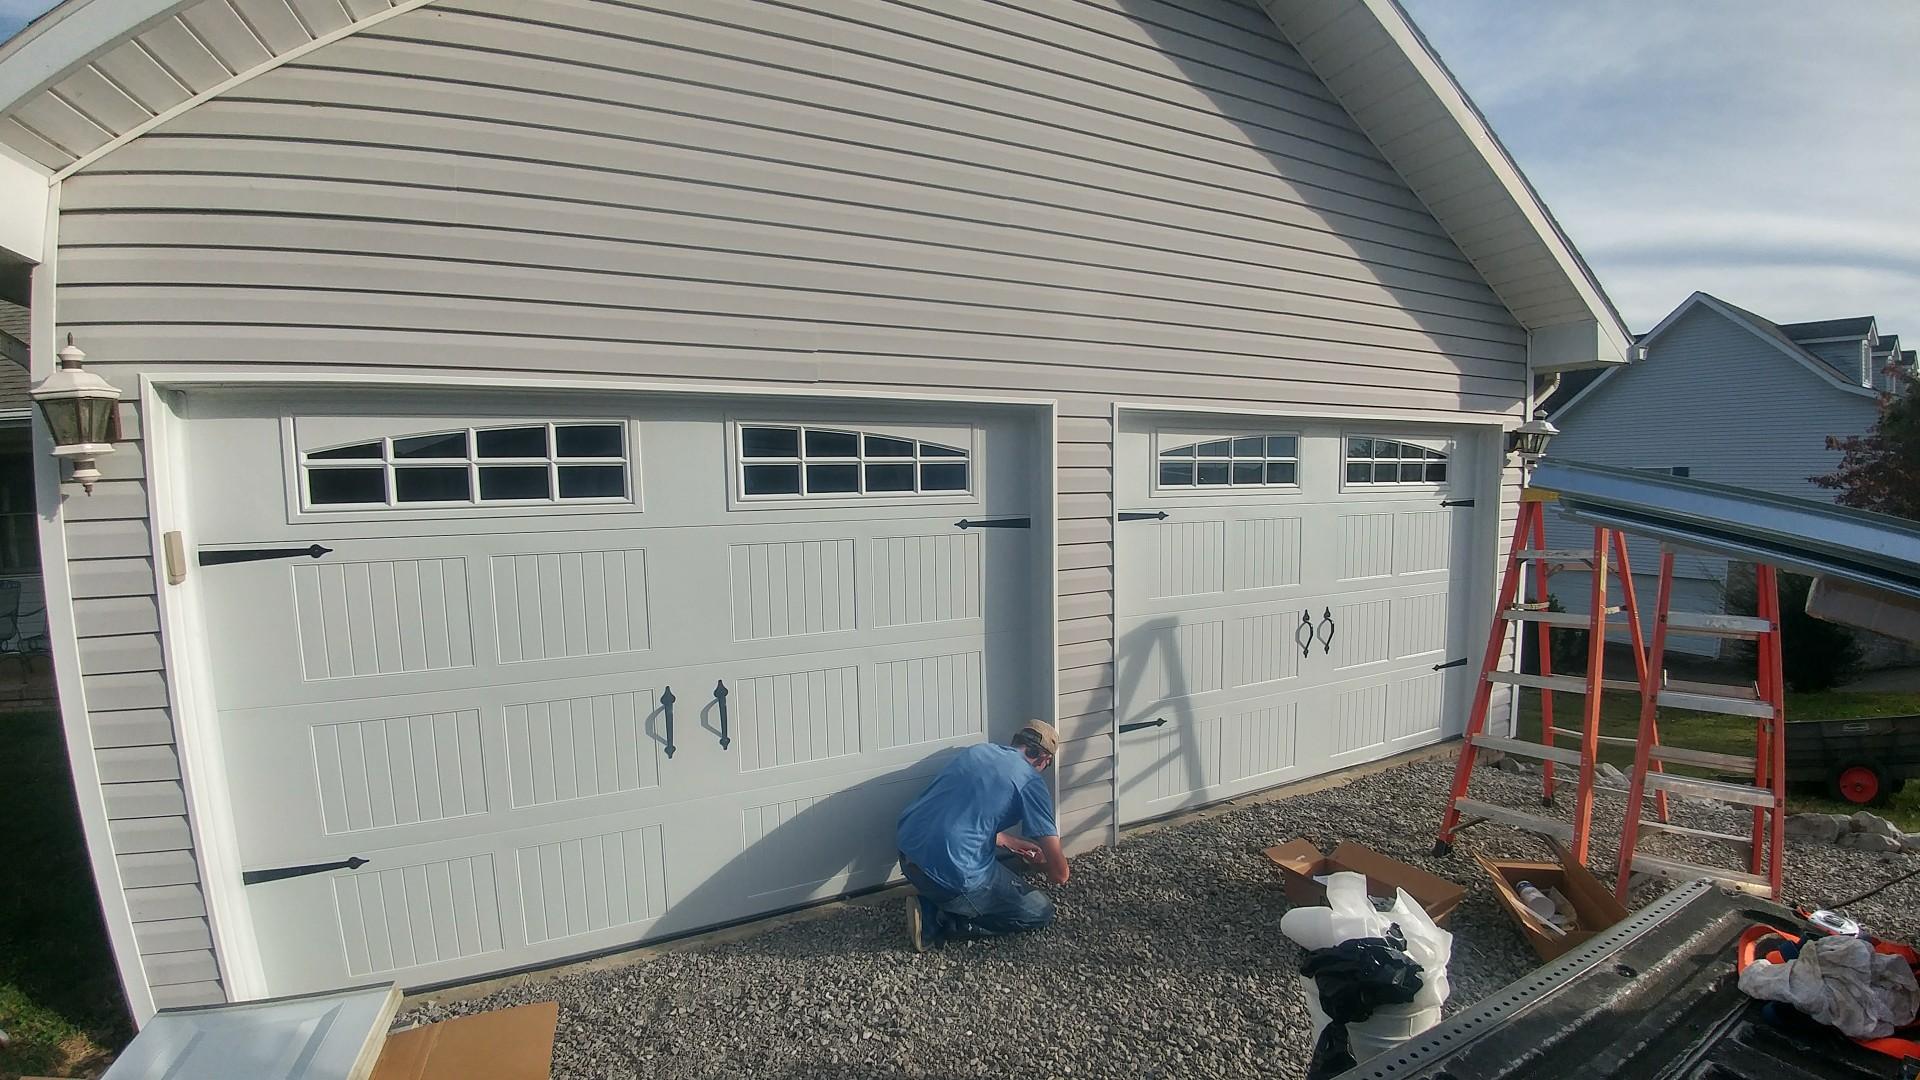 Musgove Overhead Door Company Inc 1843 Varmintrace Rd Princeton Ky 42445 Yp